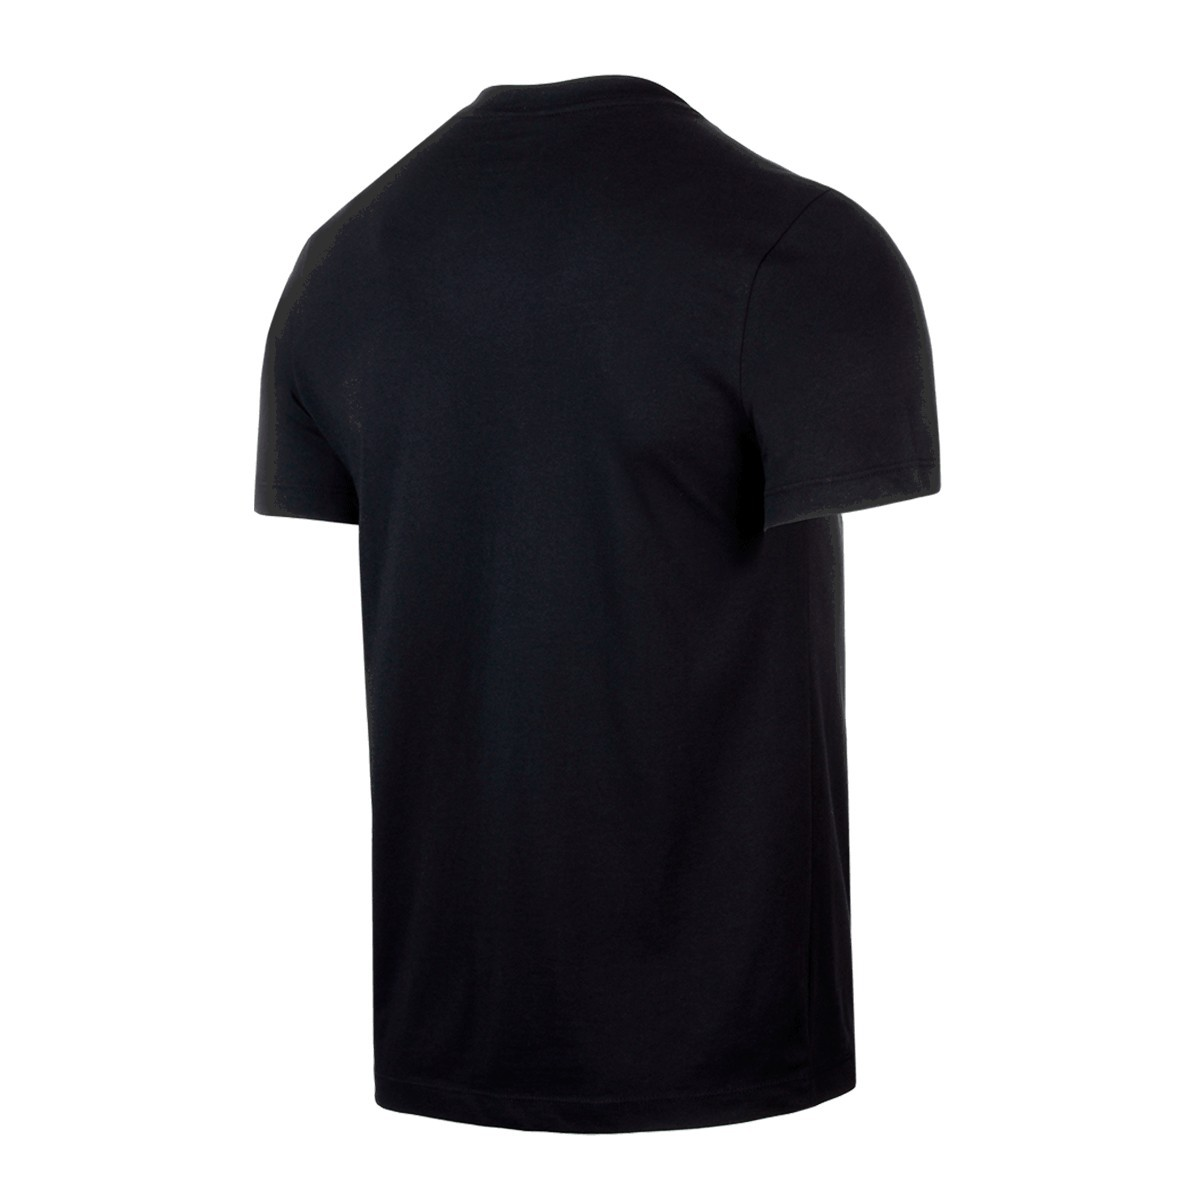 Camiseta Nike Corinthians Core Masculino Preto